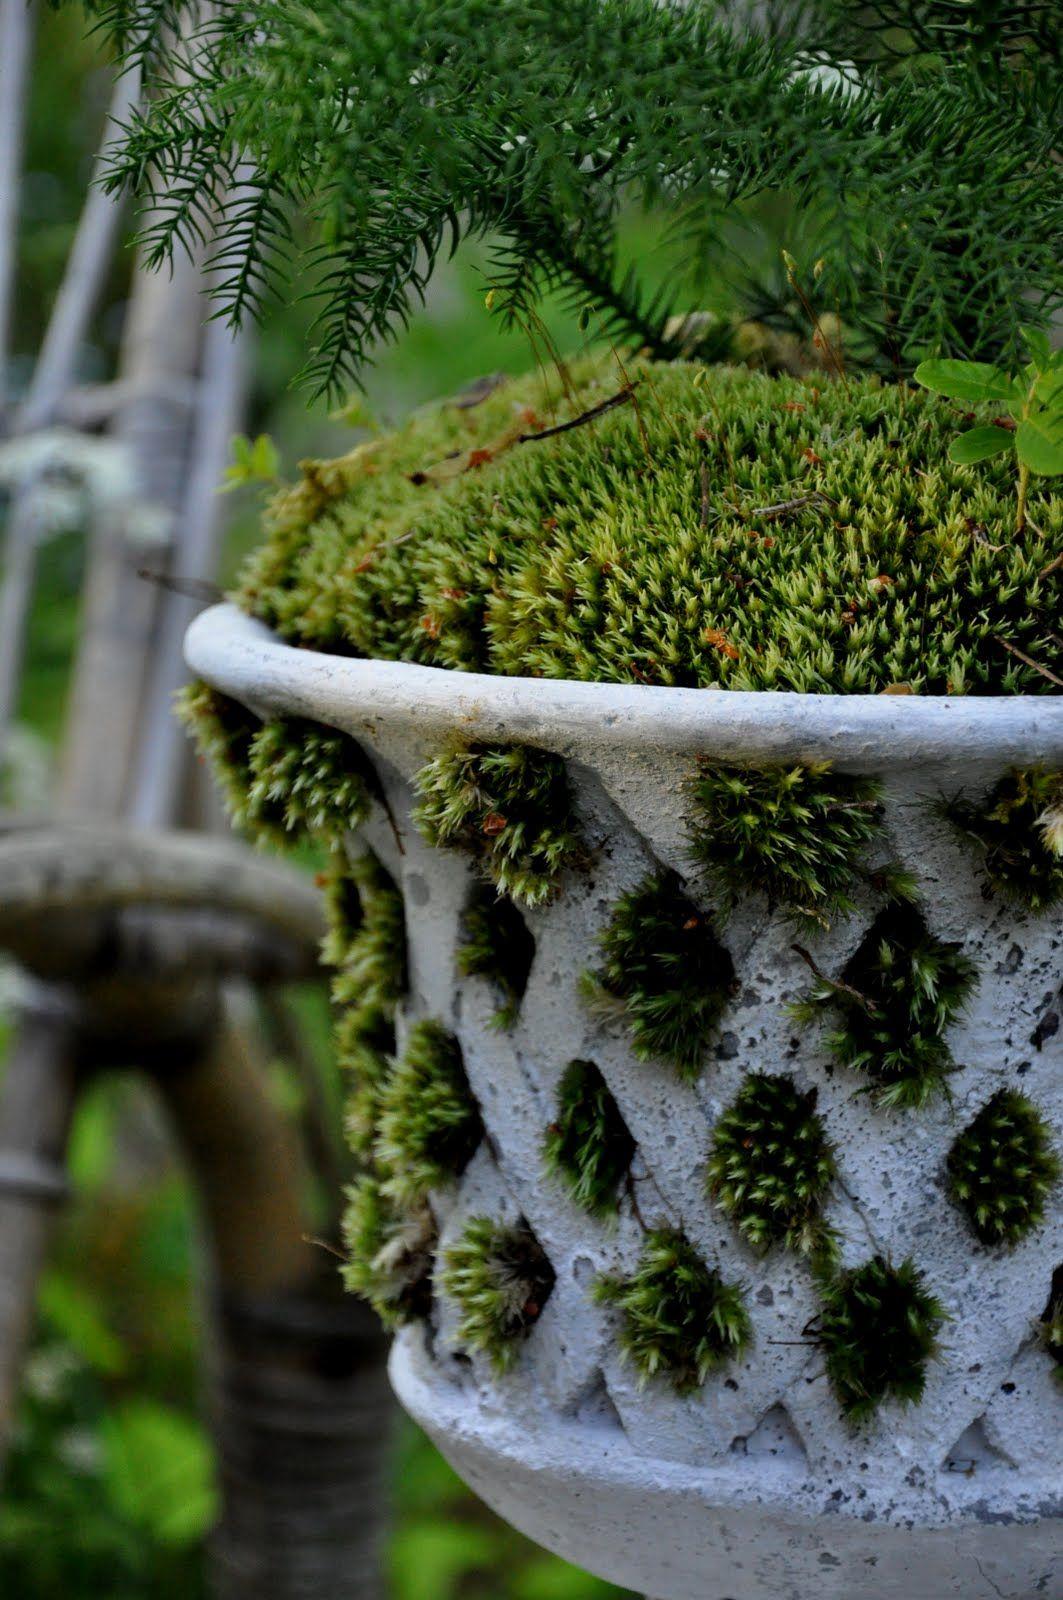 Piante Da Giardino Ombroso pin di patrizia centofanti su giardino ombroso - shade